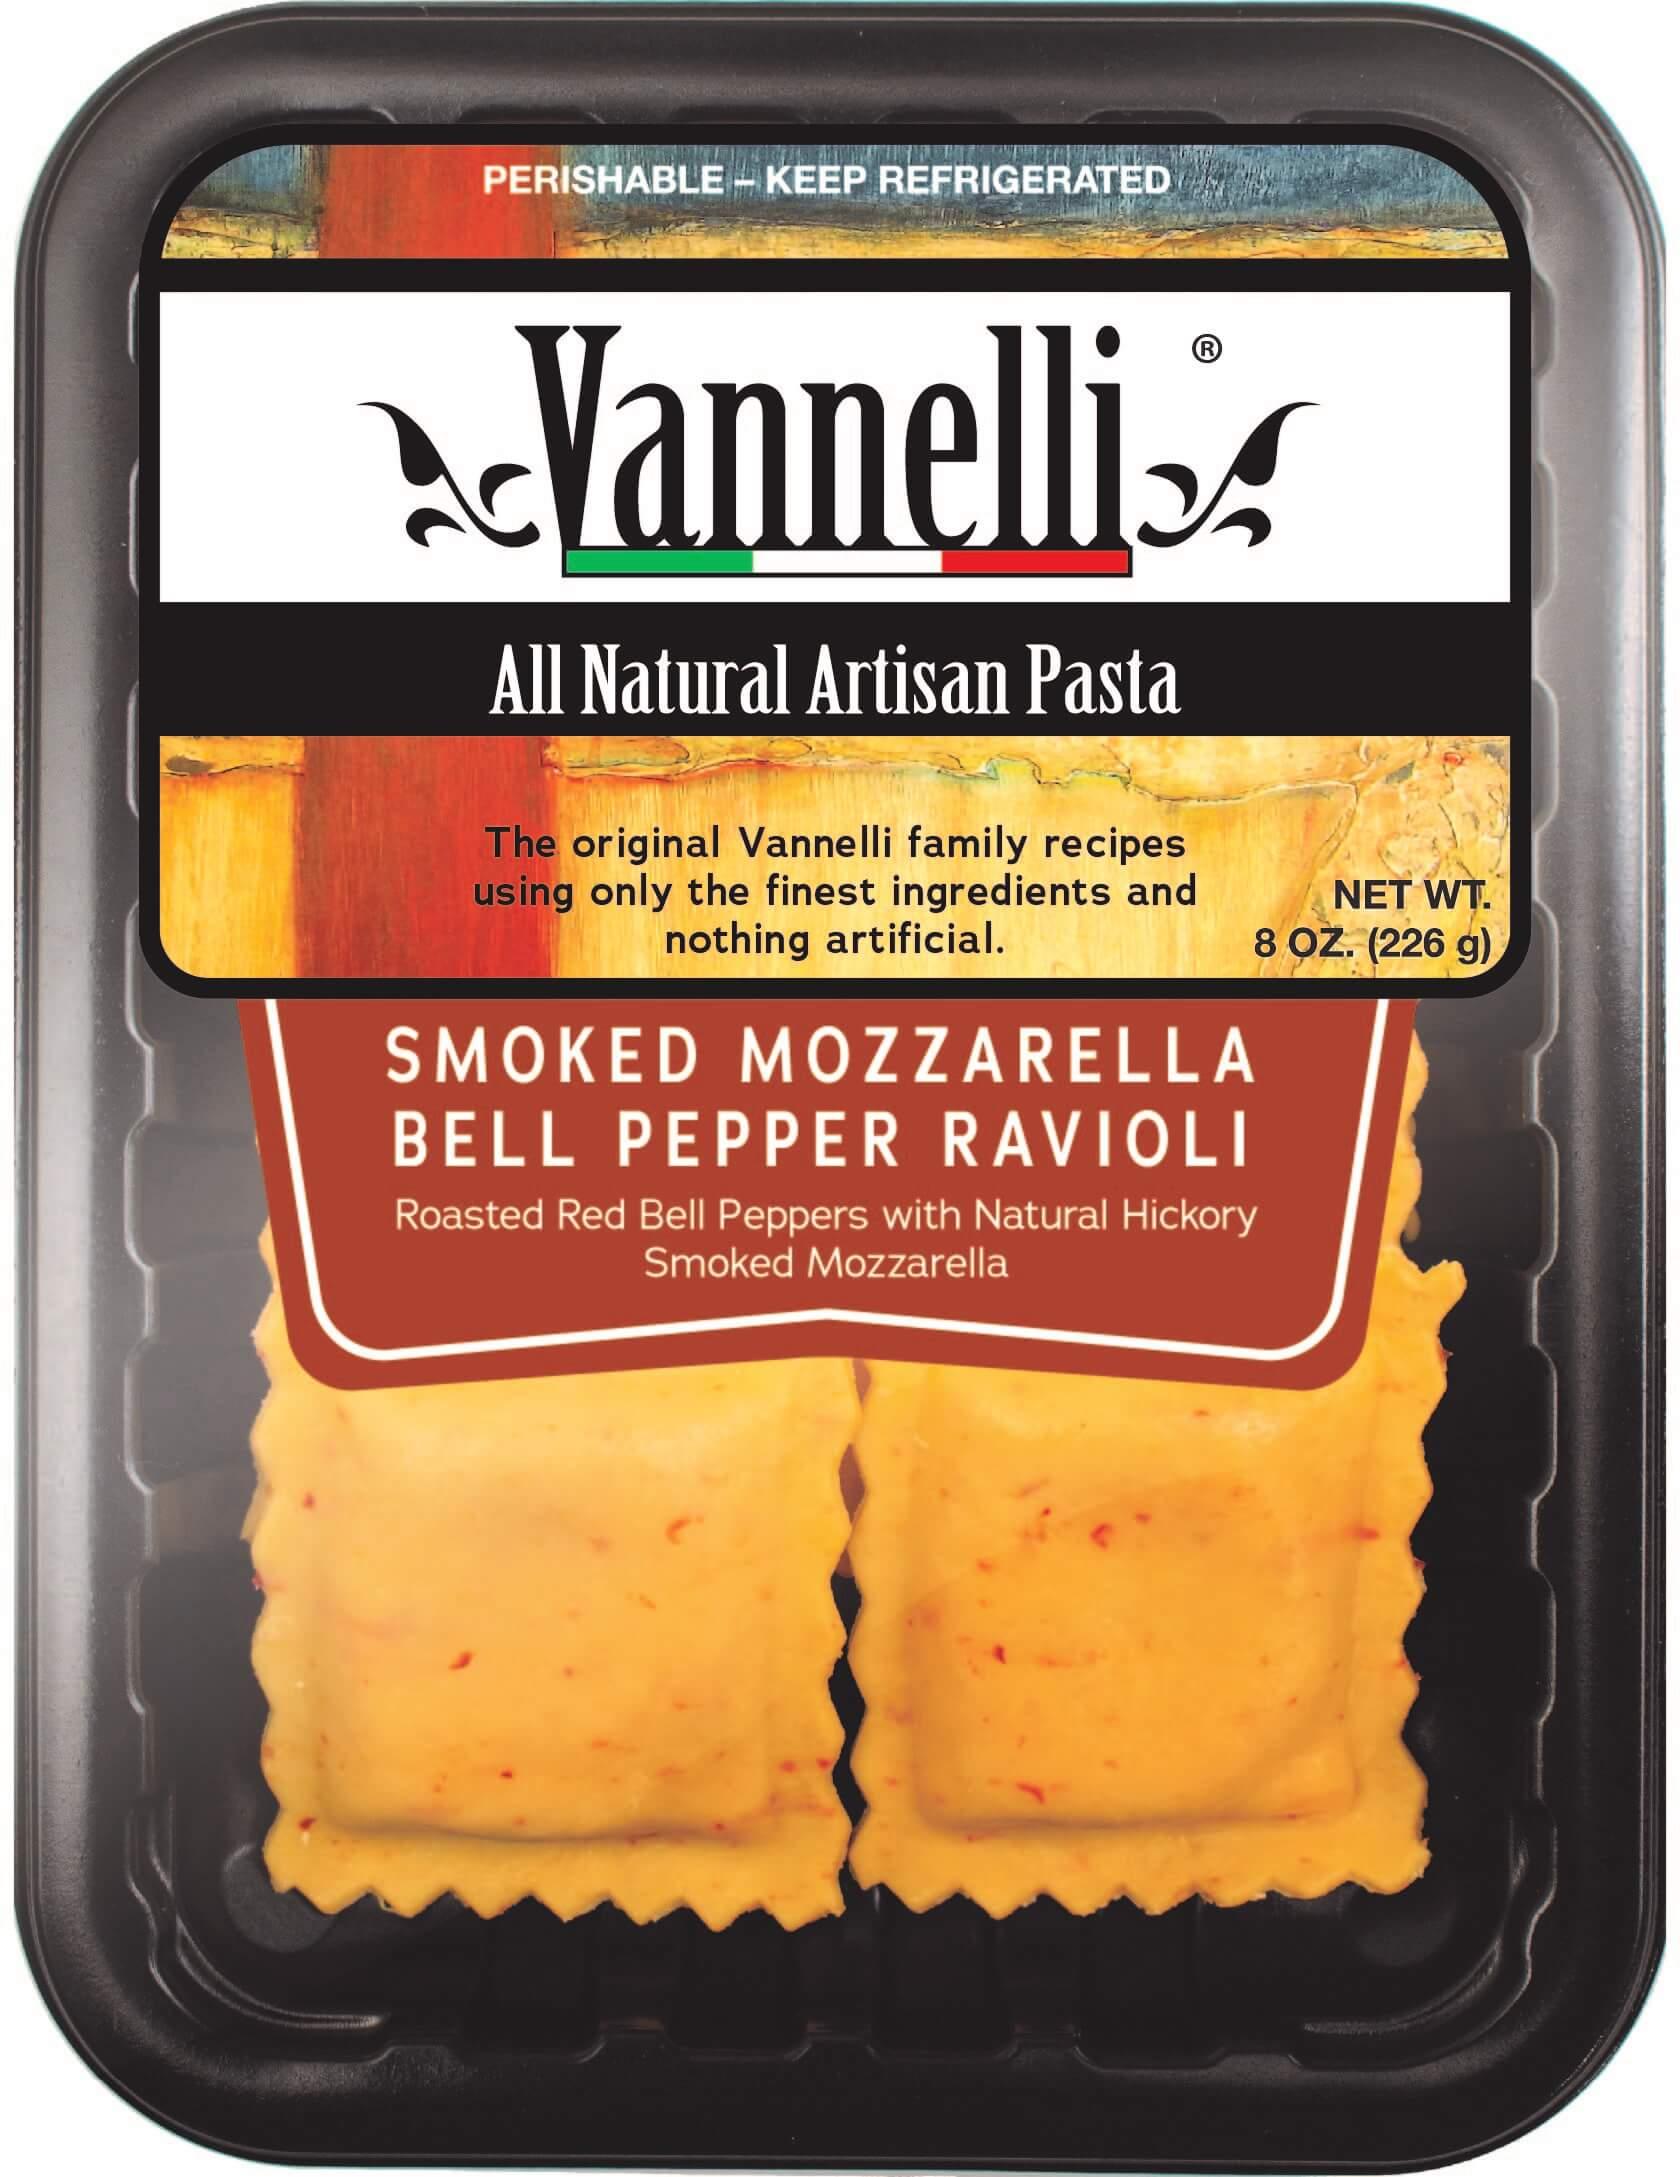 Smoked Mozzarella Ravioli